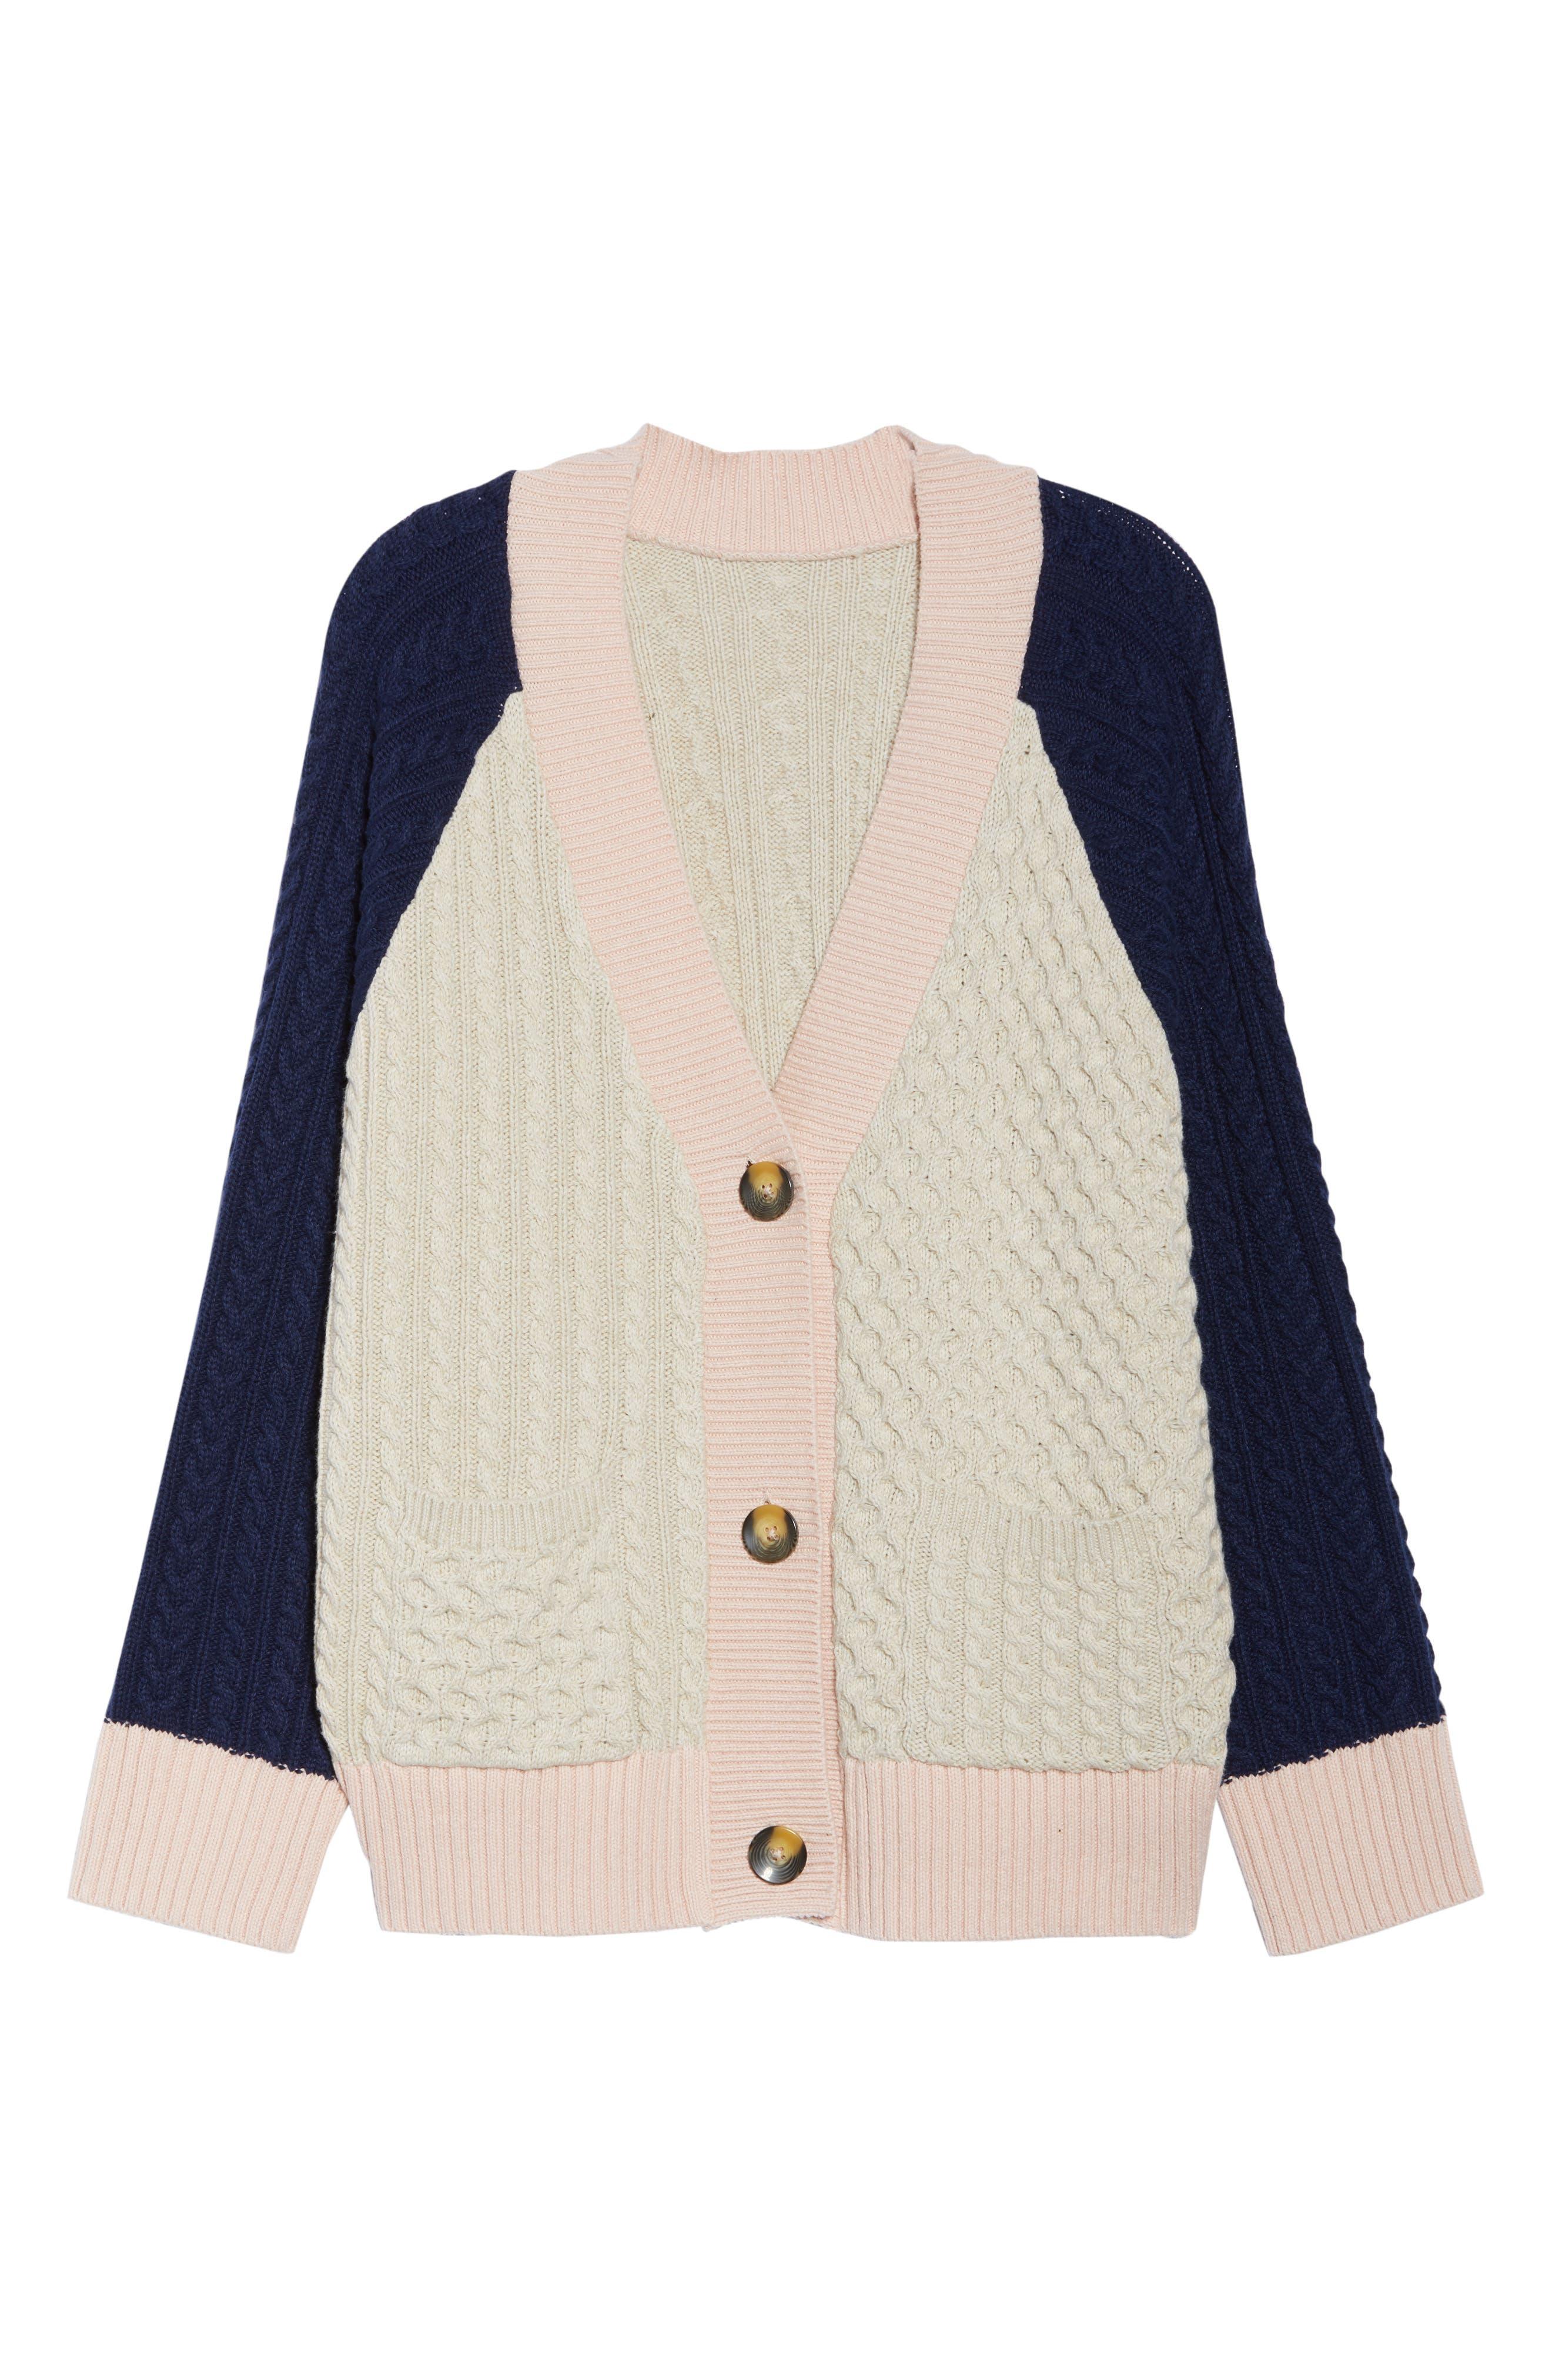 Colorblock Cable Knit Button Cardigan,                             Alternate thumbnail 7, color,                             900